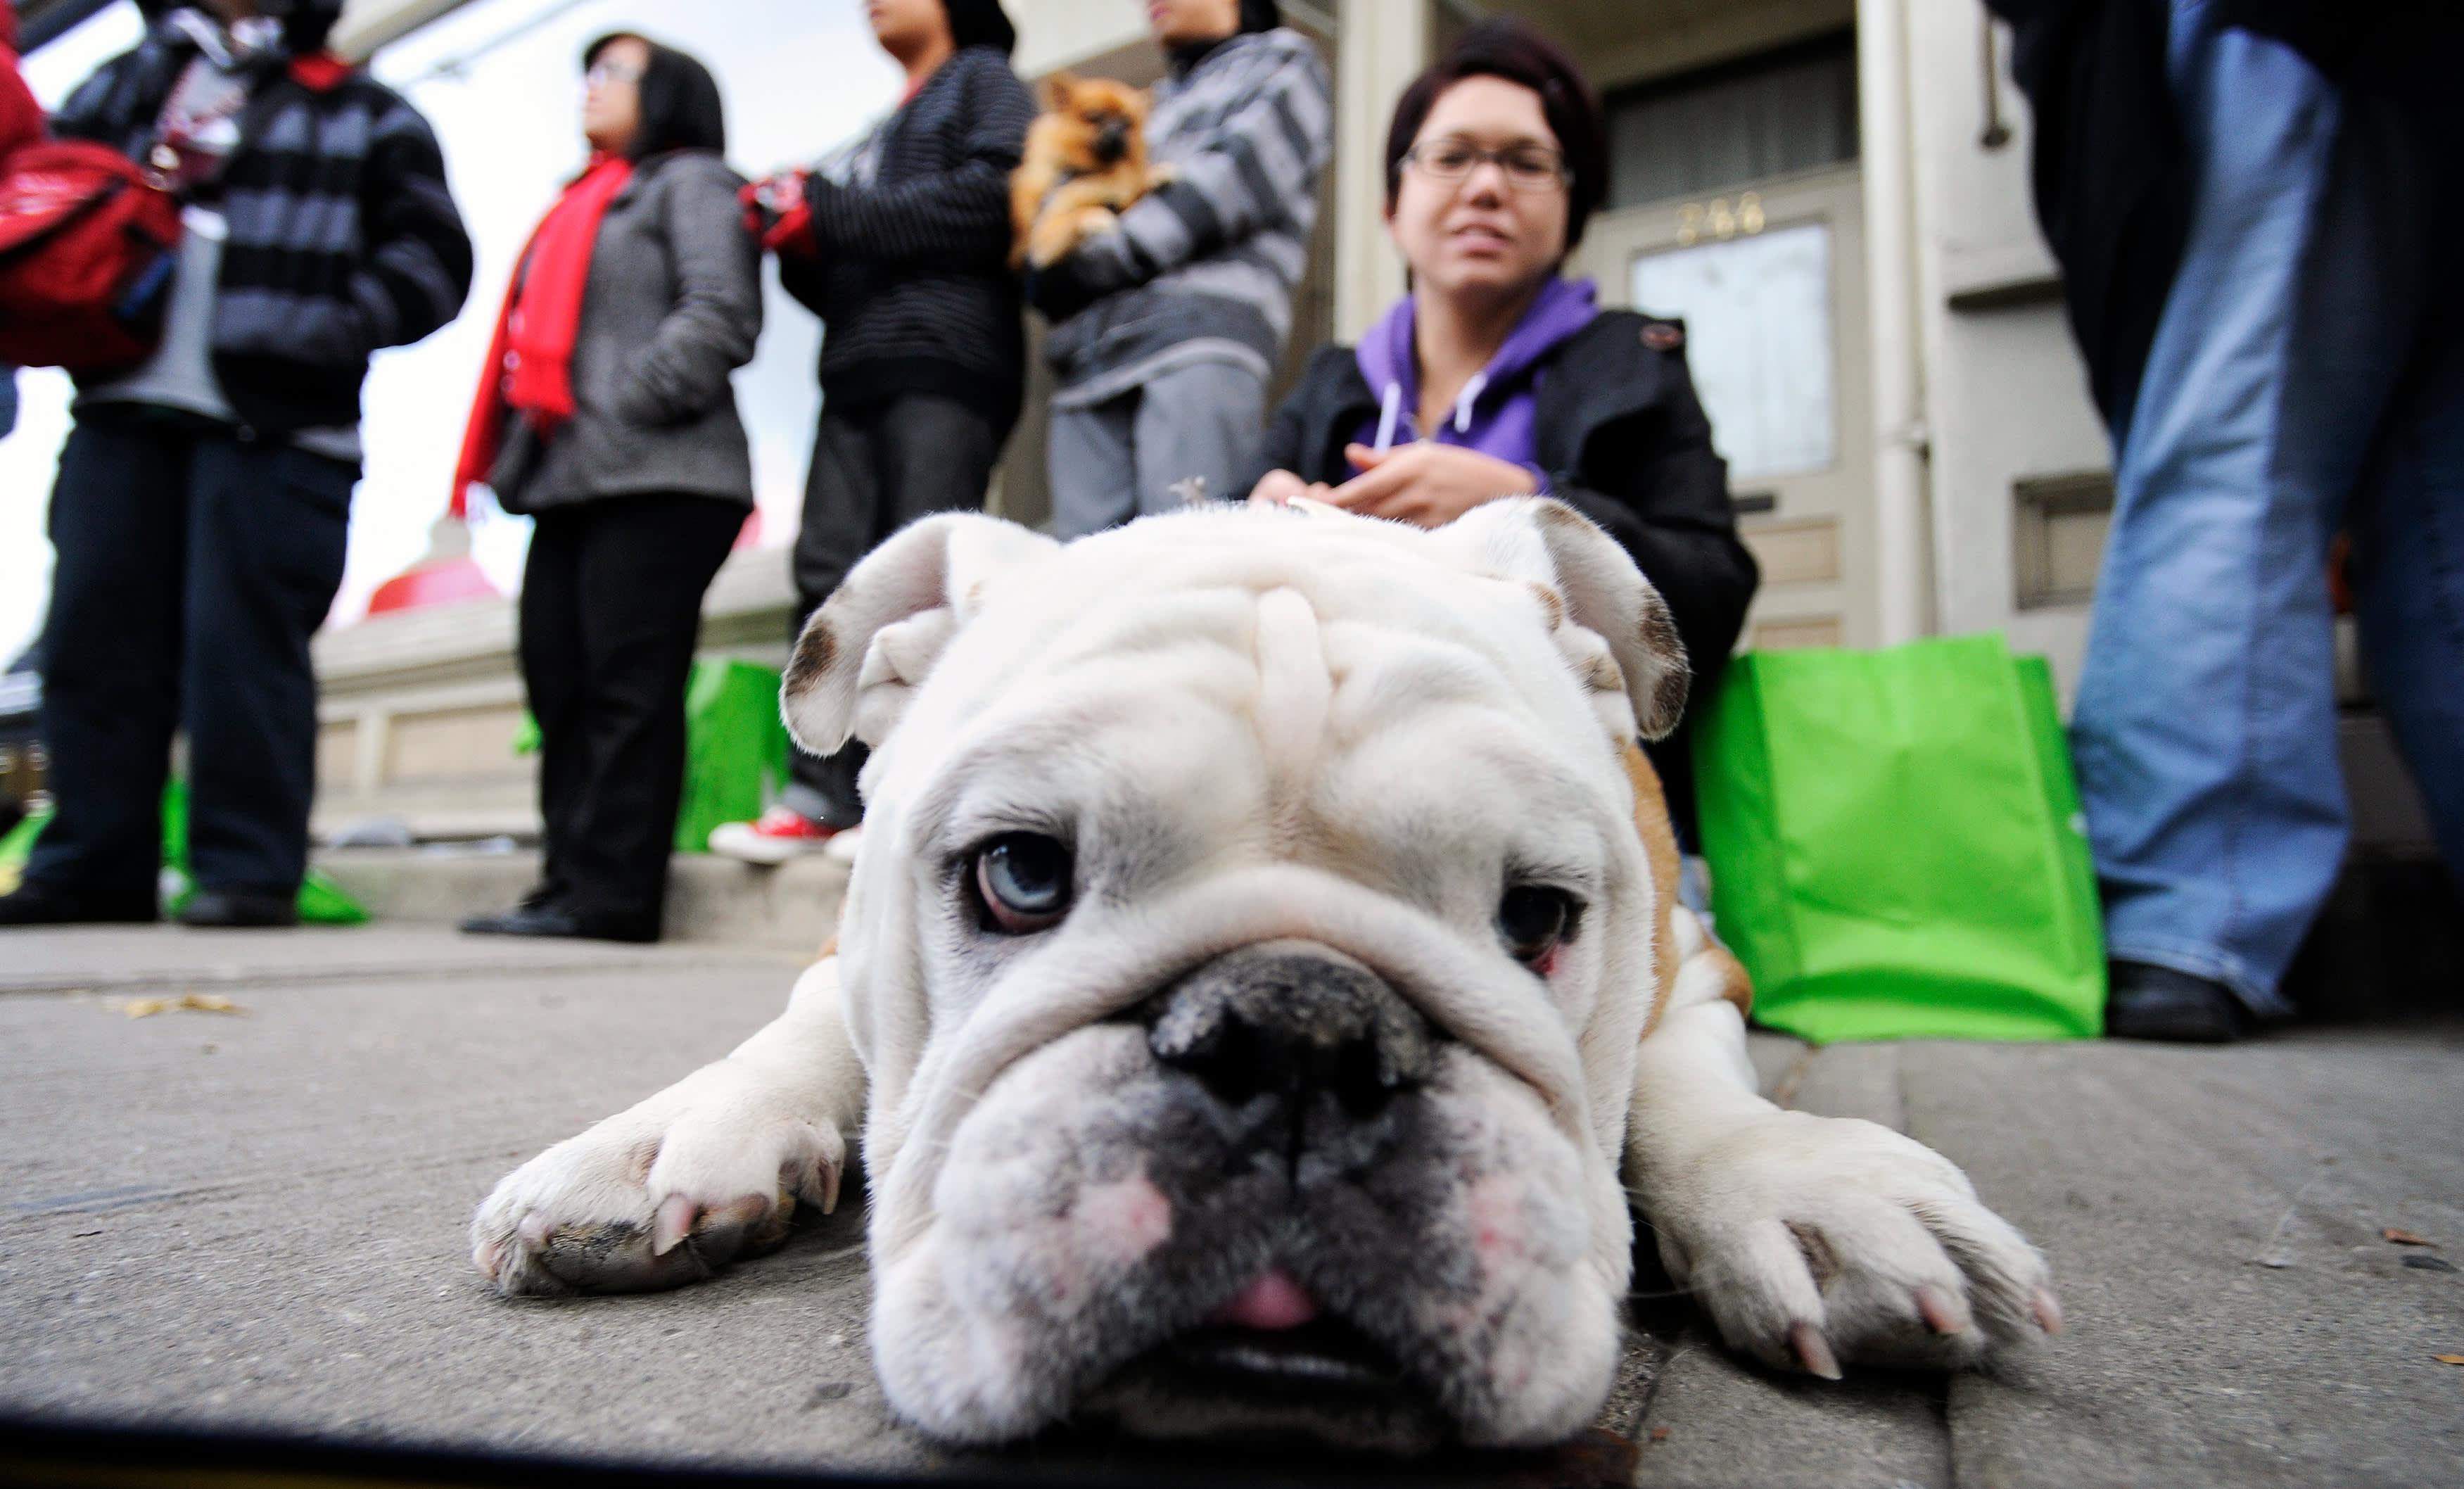 Pet Valu Pet Supply Retailer To Shut Down U S Operations